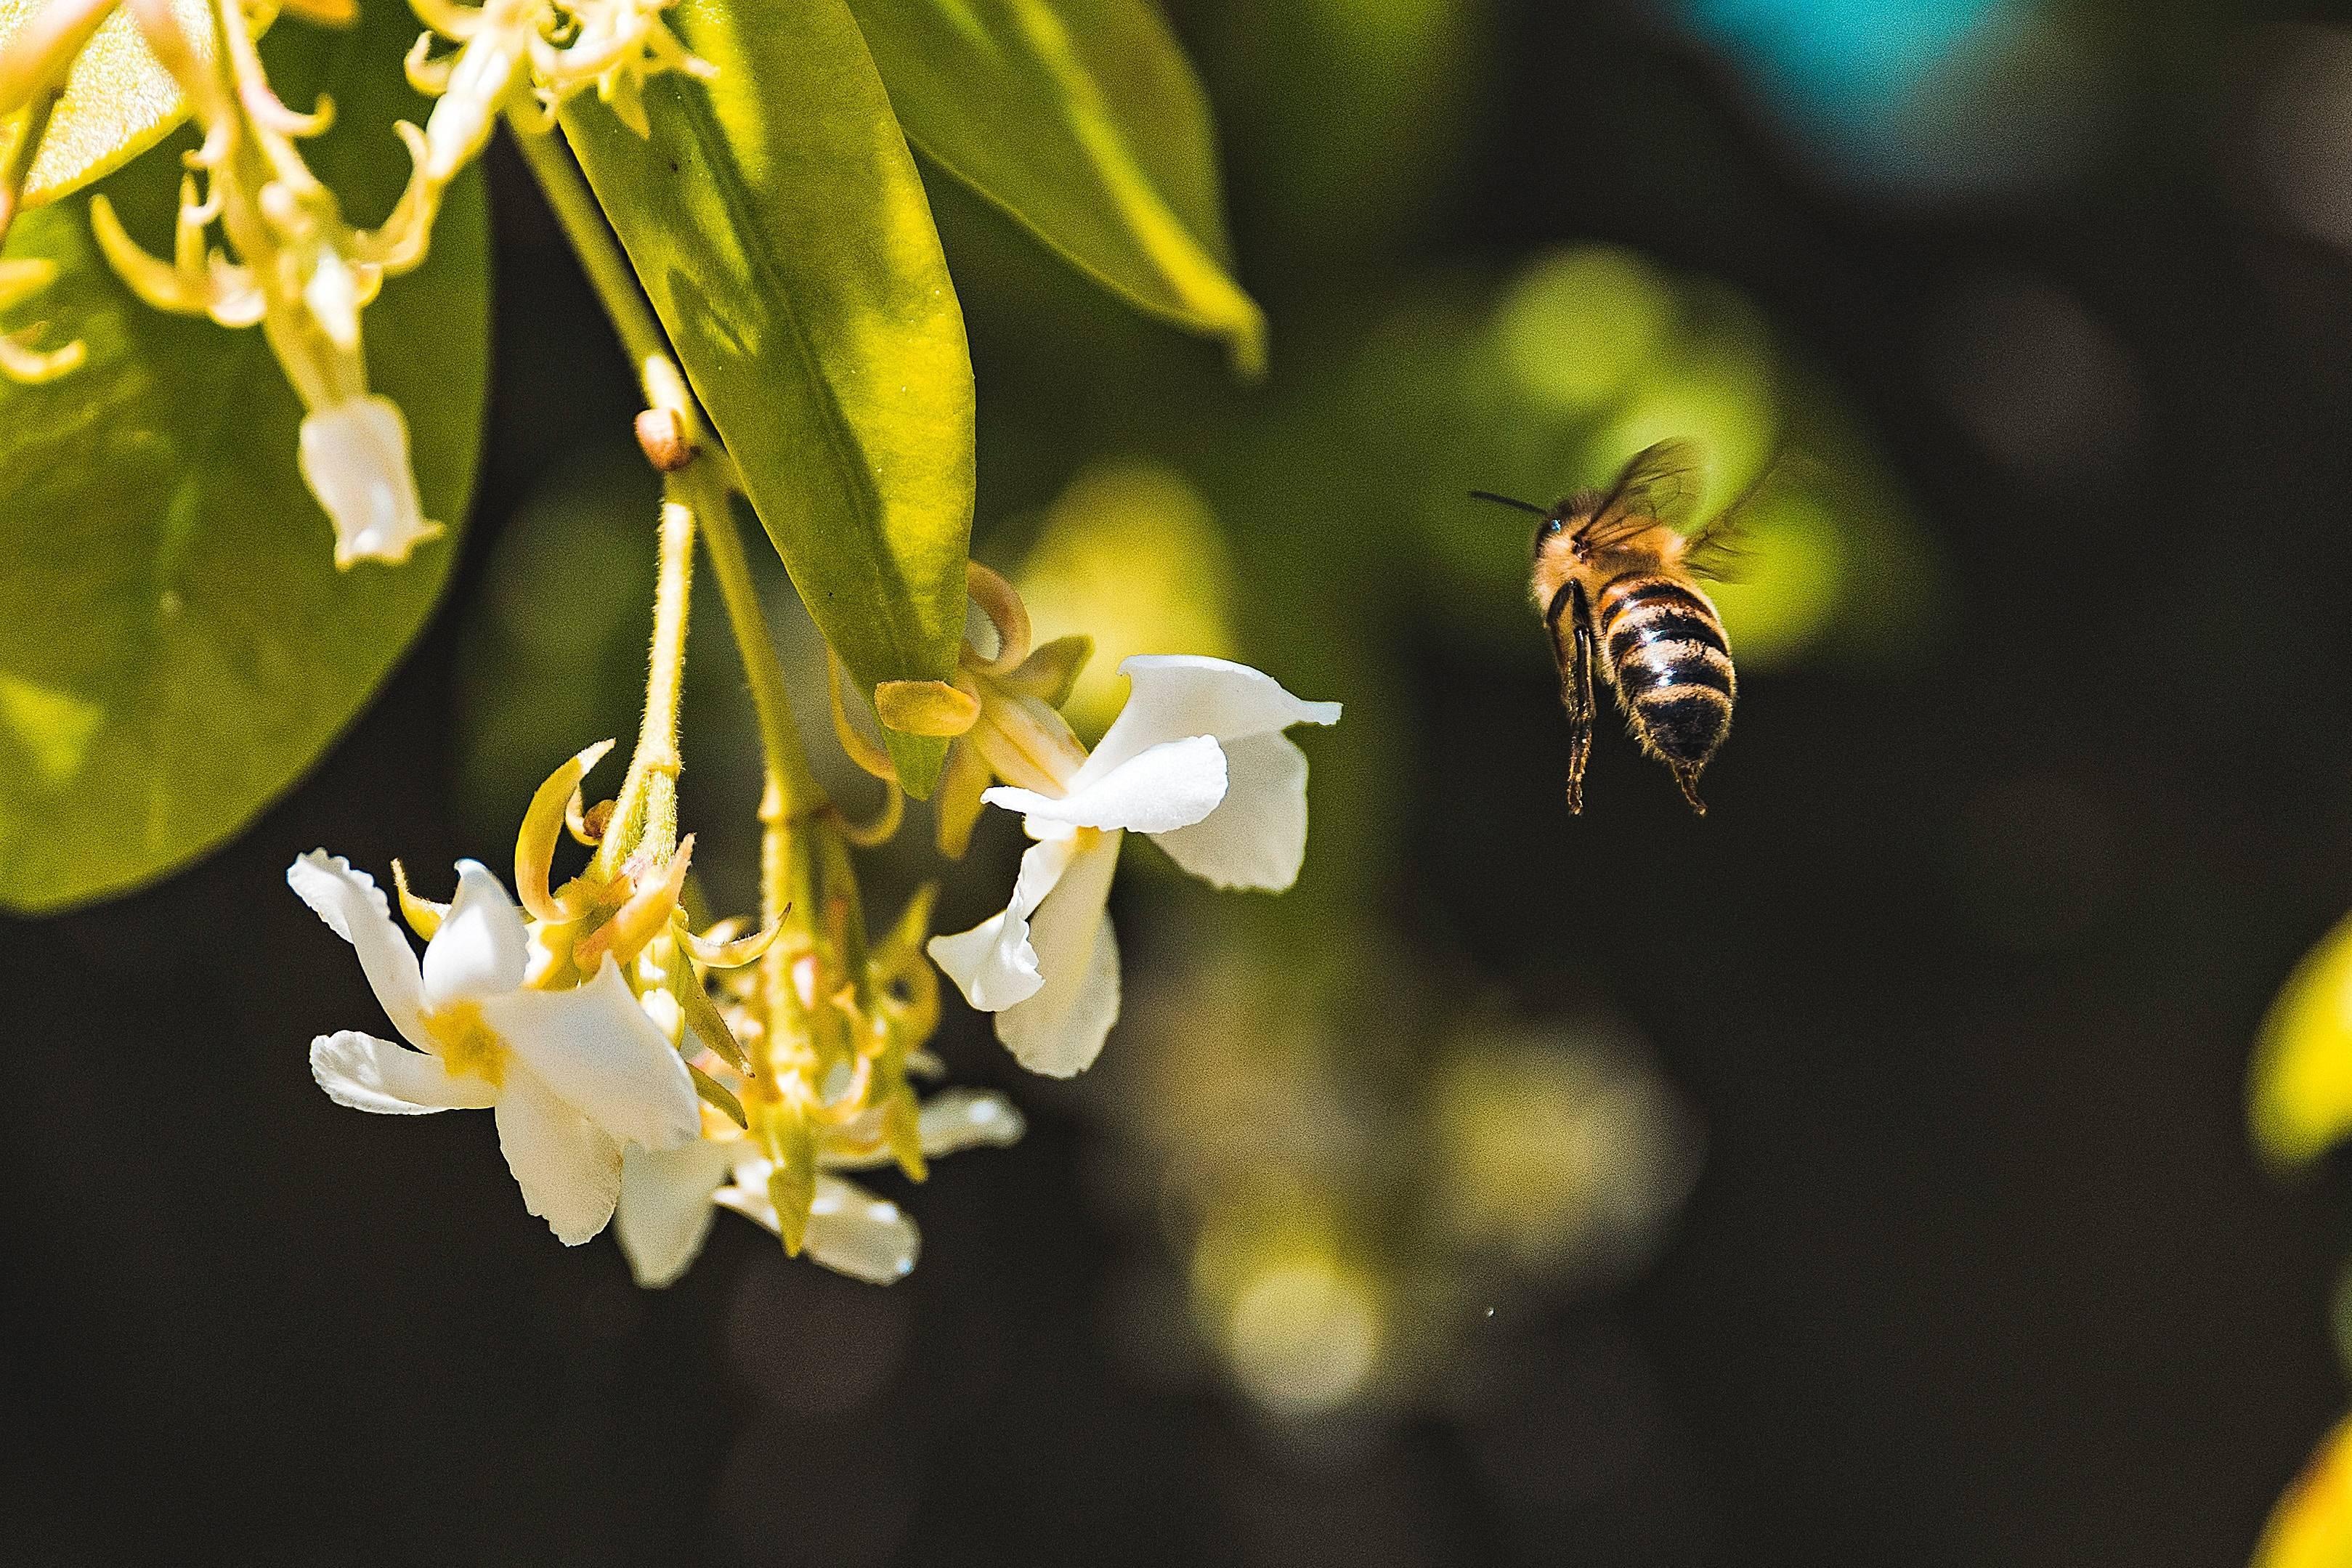 d406db26201bfffc222d_bees.jpg